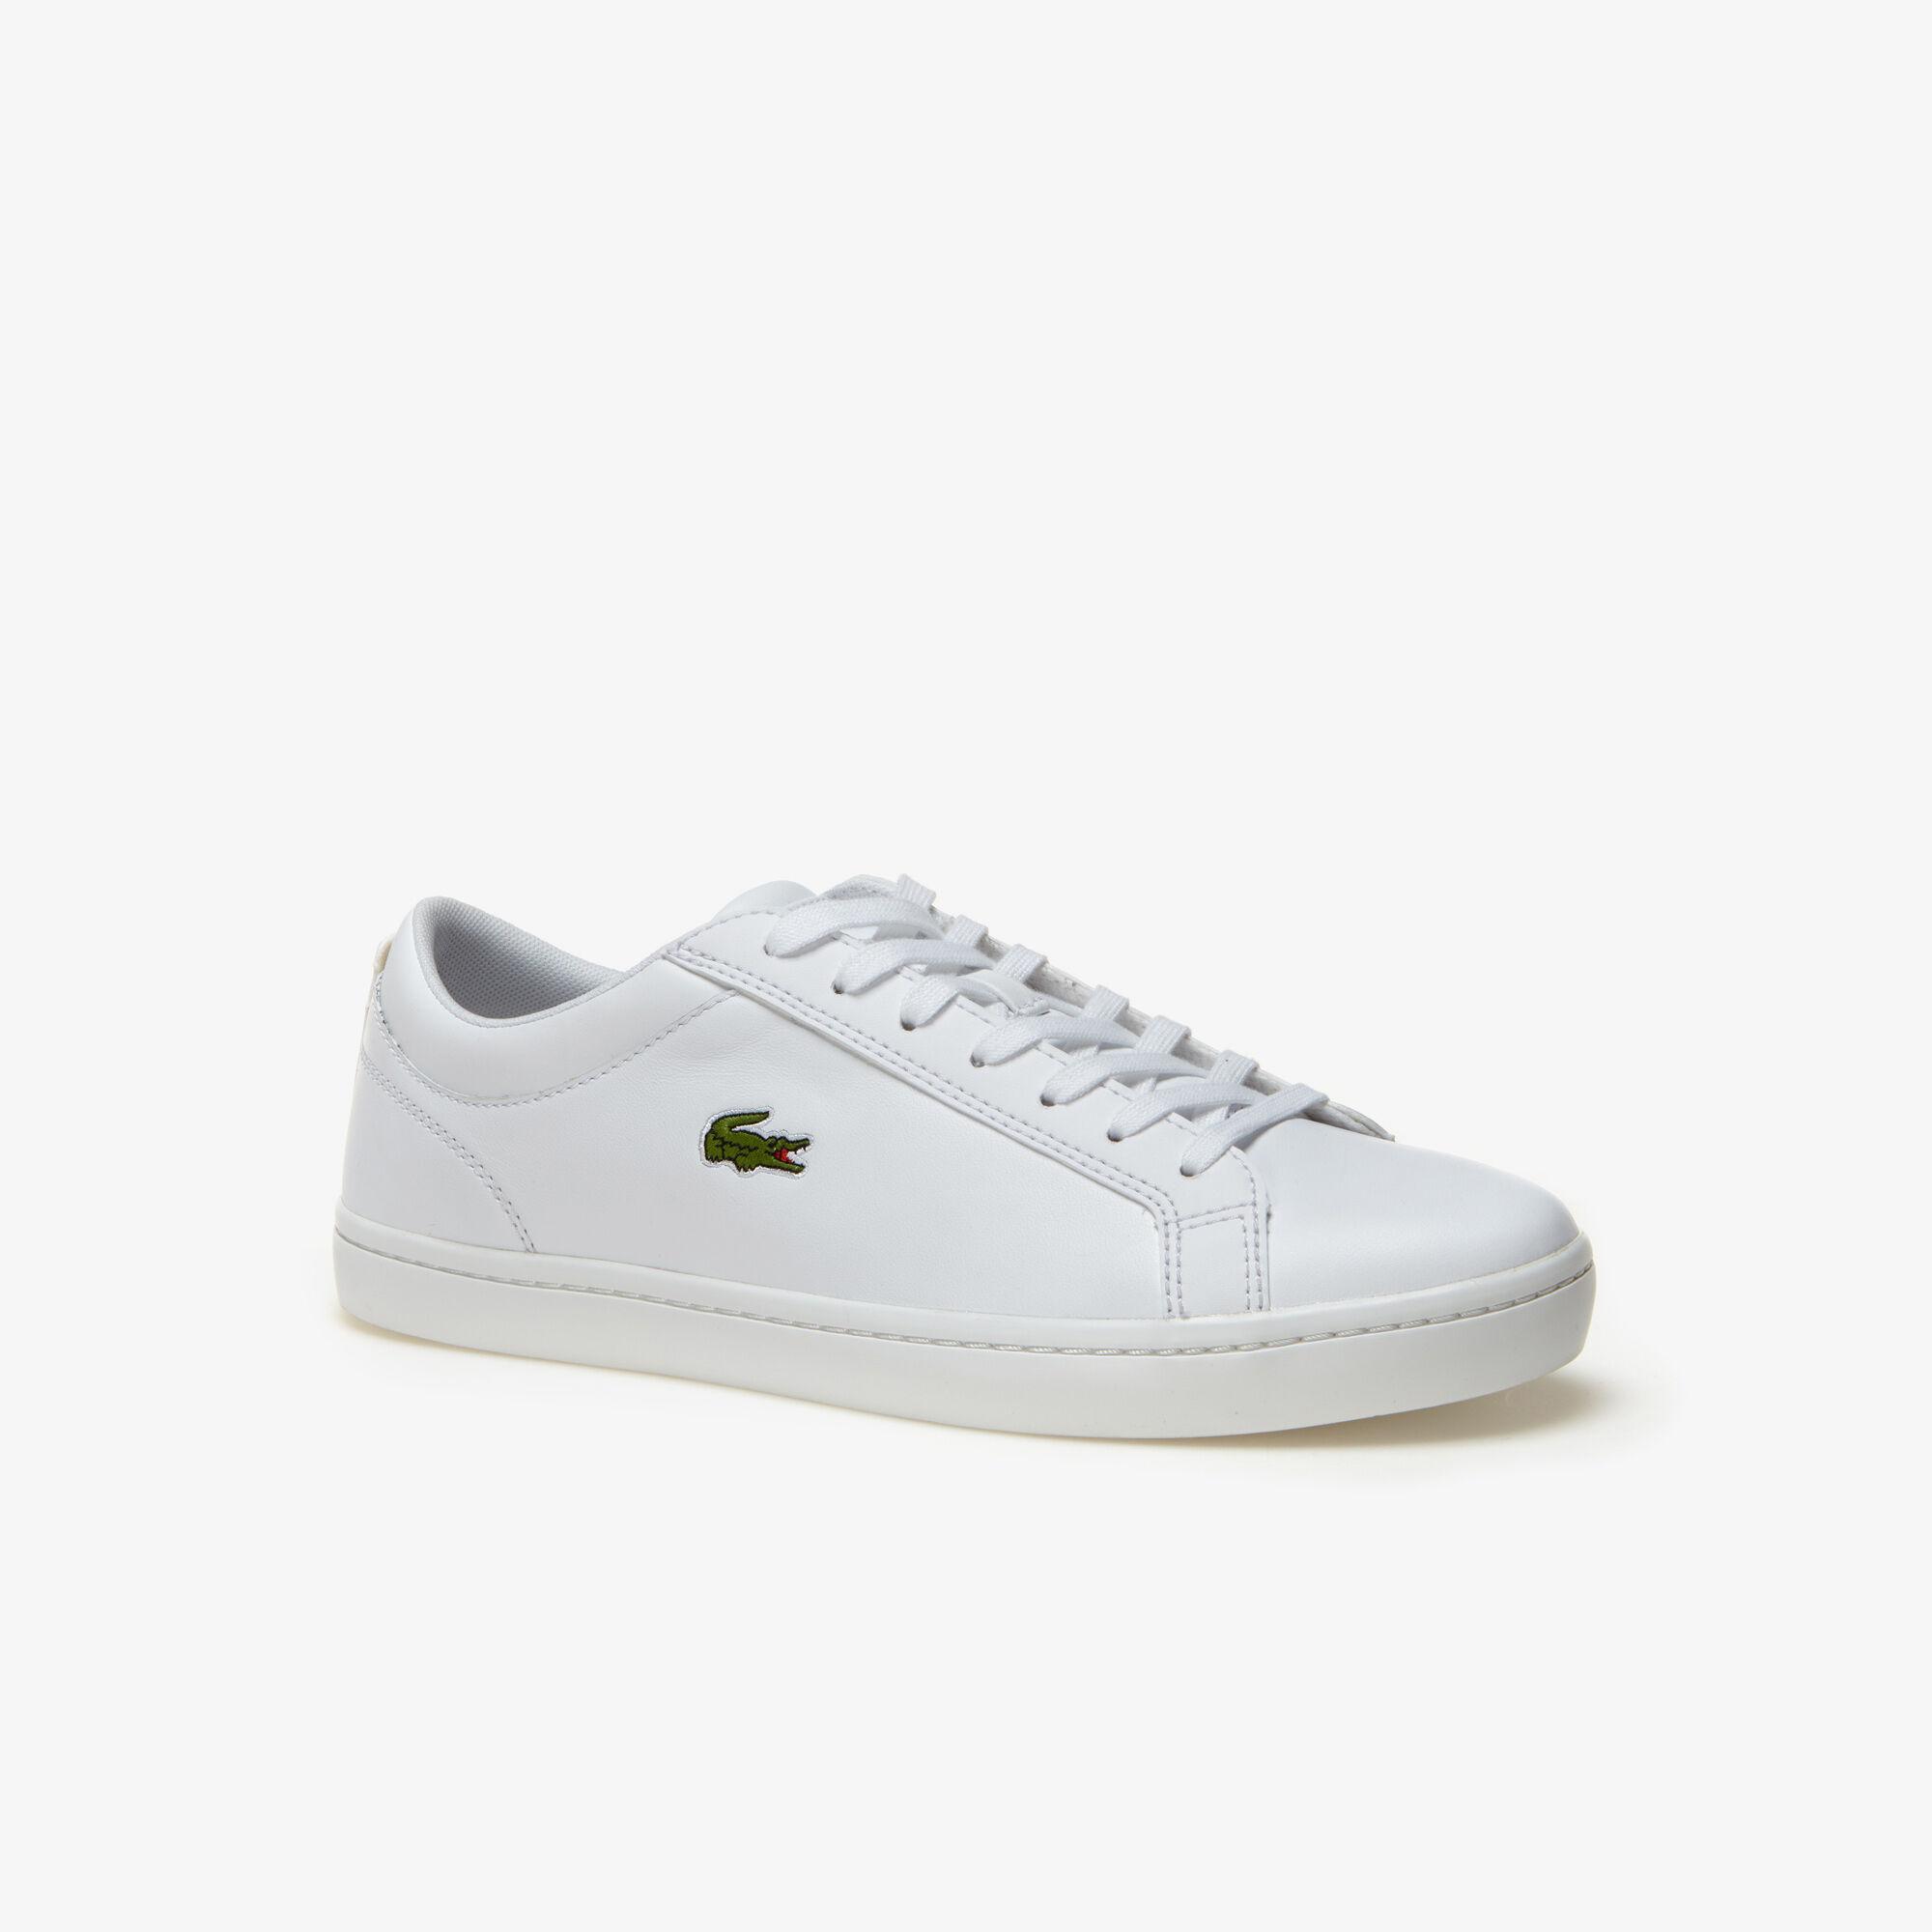 Best Lacoste for Men Straightset White Sneakers Deals 6379987